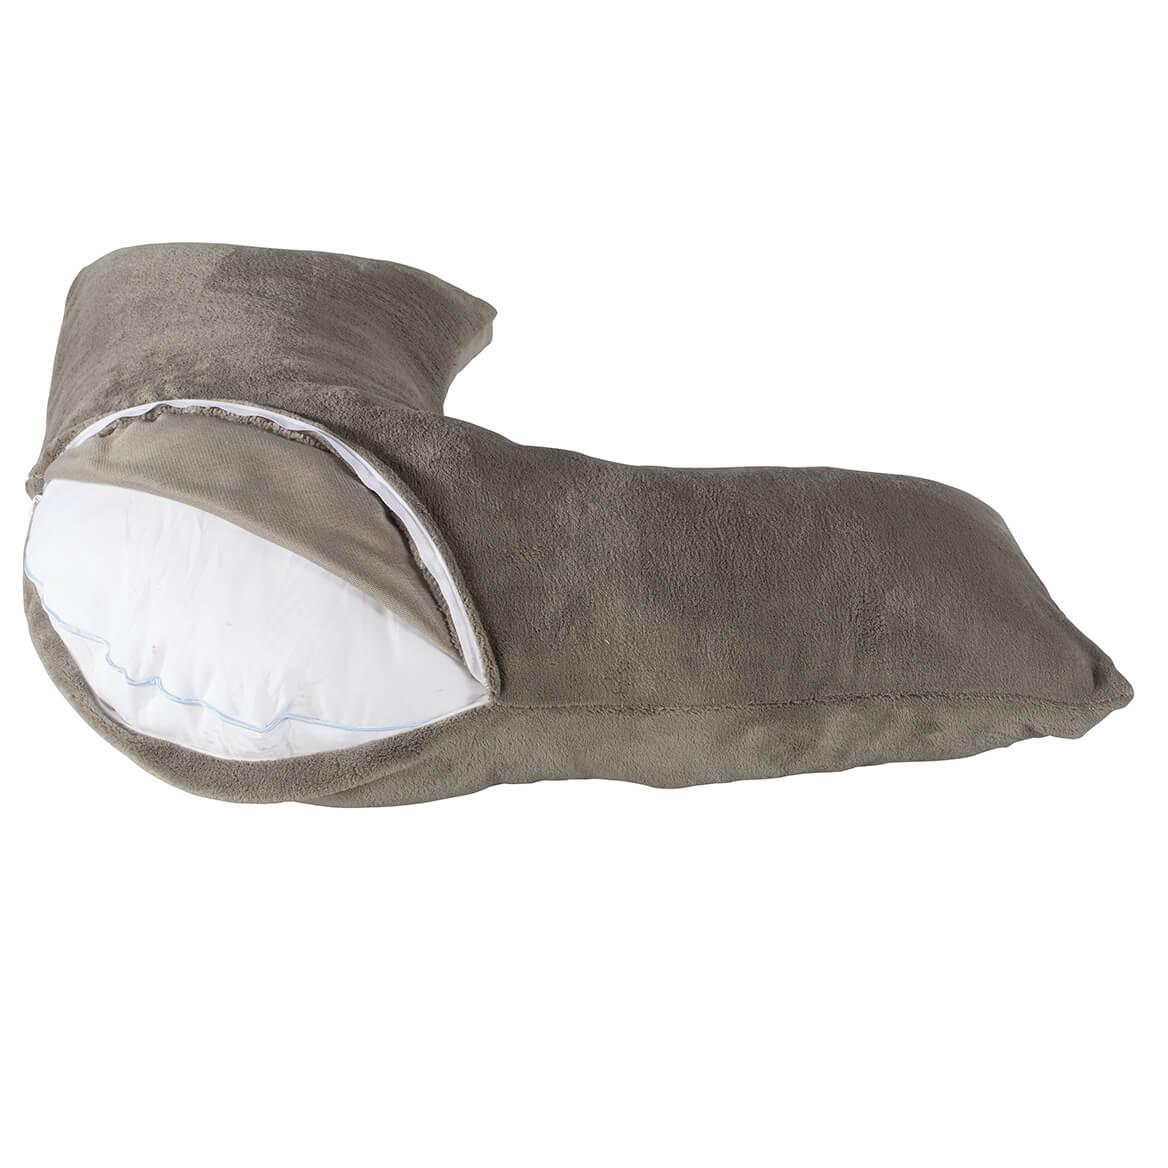 Plush L-Shaped Pillow Cover by LivingSURE™-365687